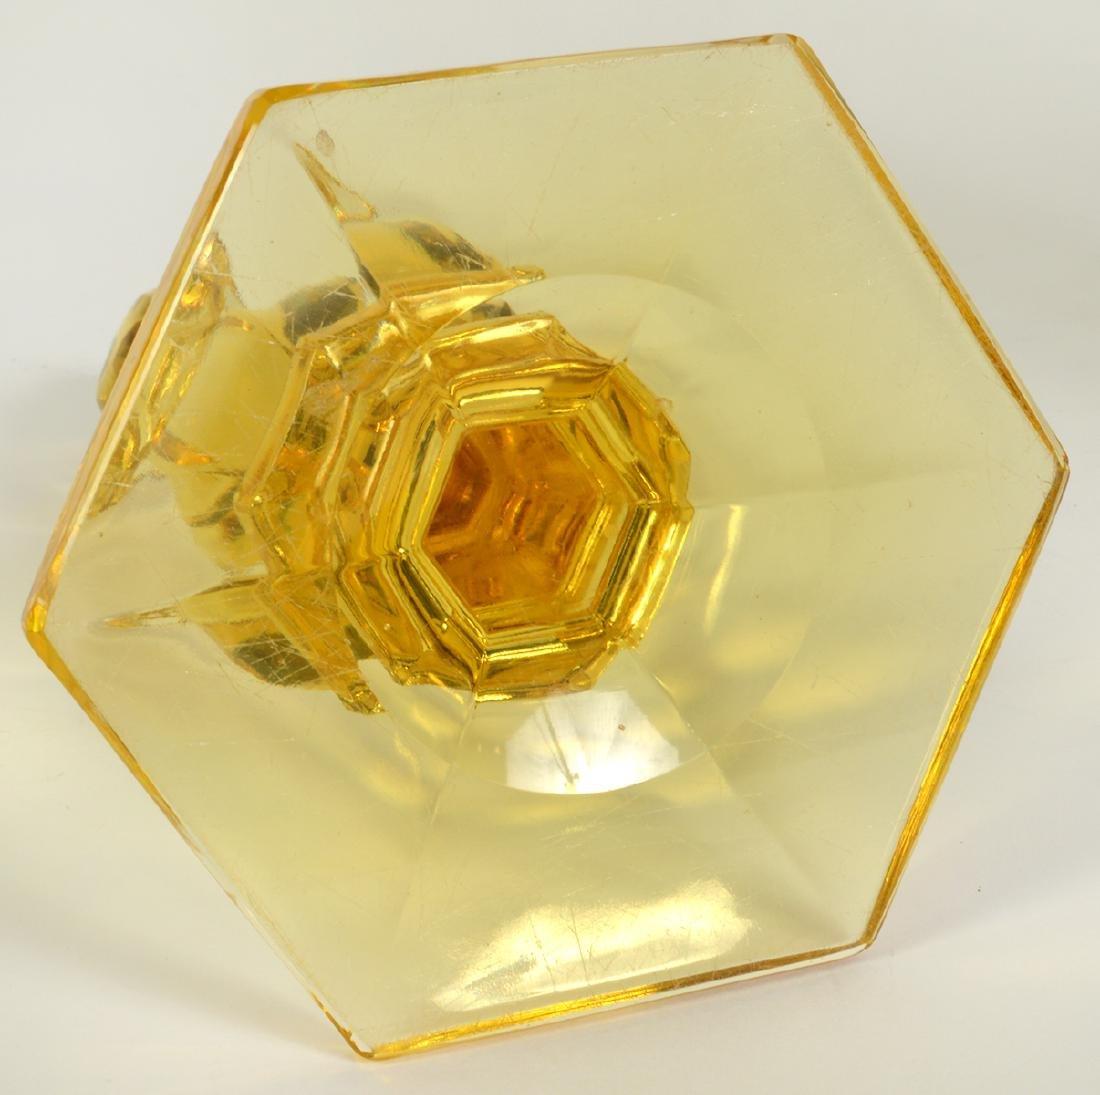 Pr. Heisey Sahara Yellow Glass Candlestick - 7